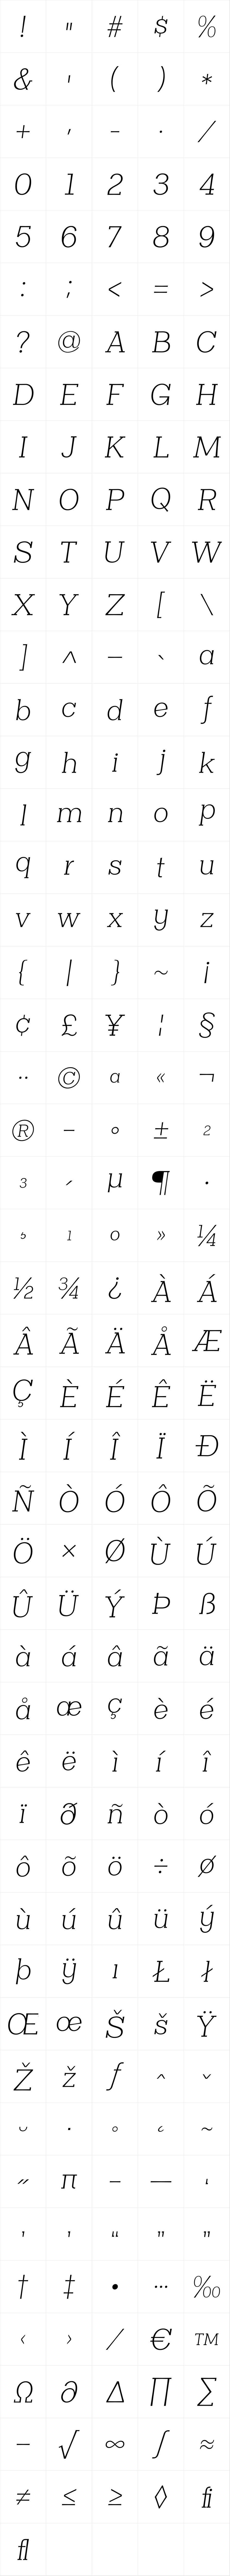 Clasica Slab Light Italic